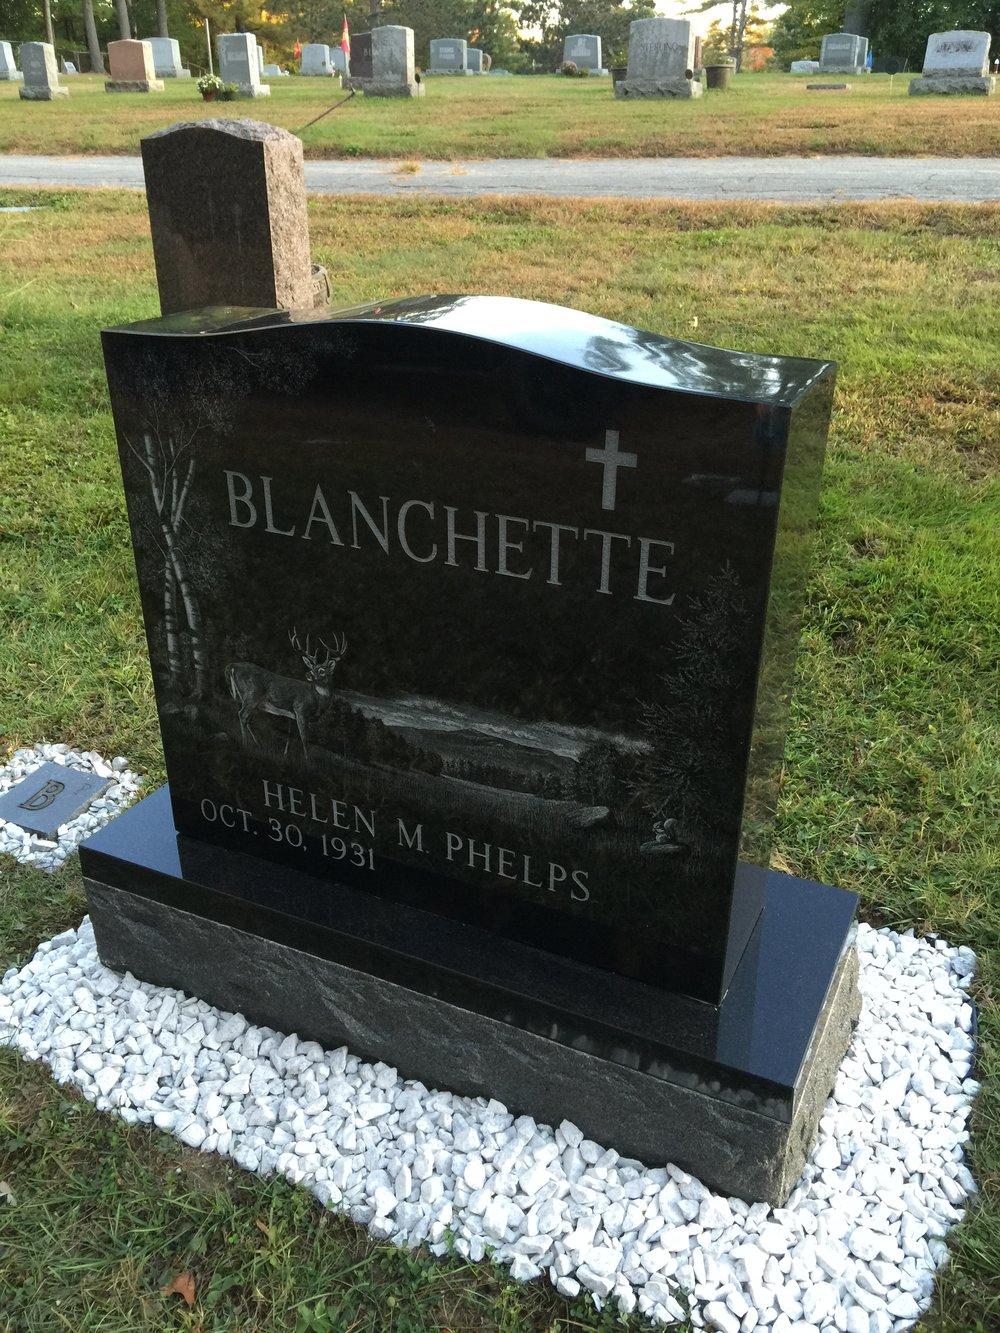 BLANCHETTE-PHELPSfinished 2.JPG